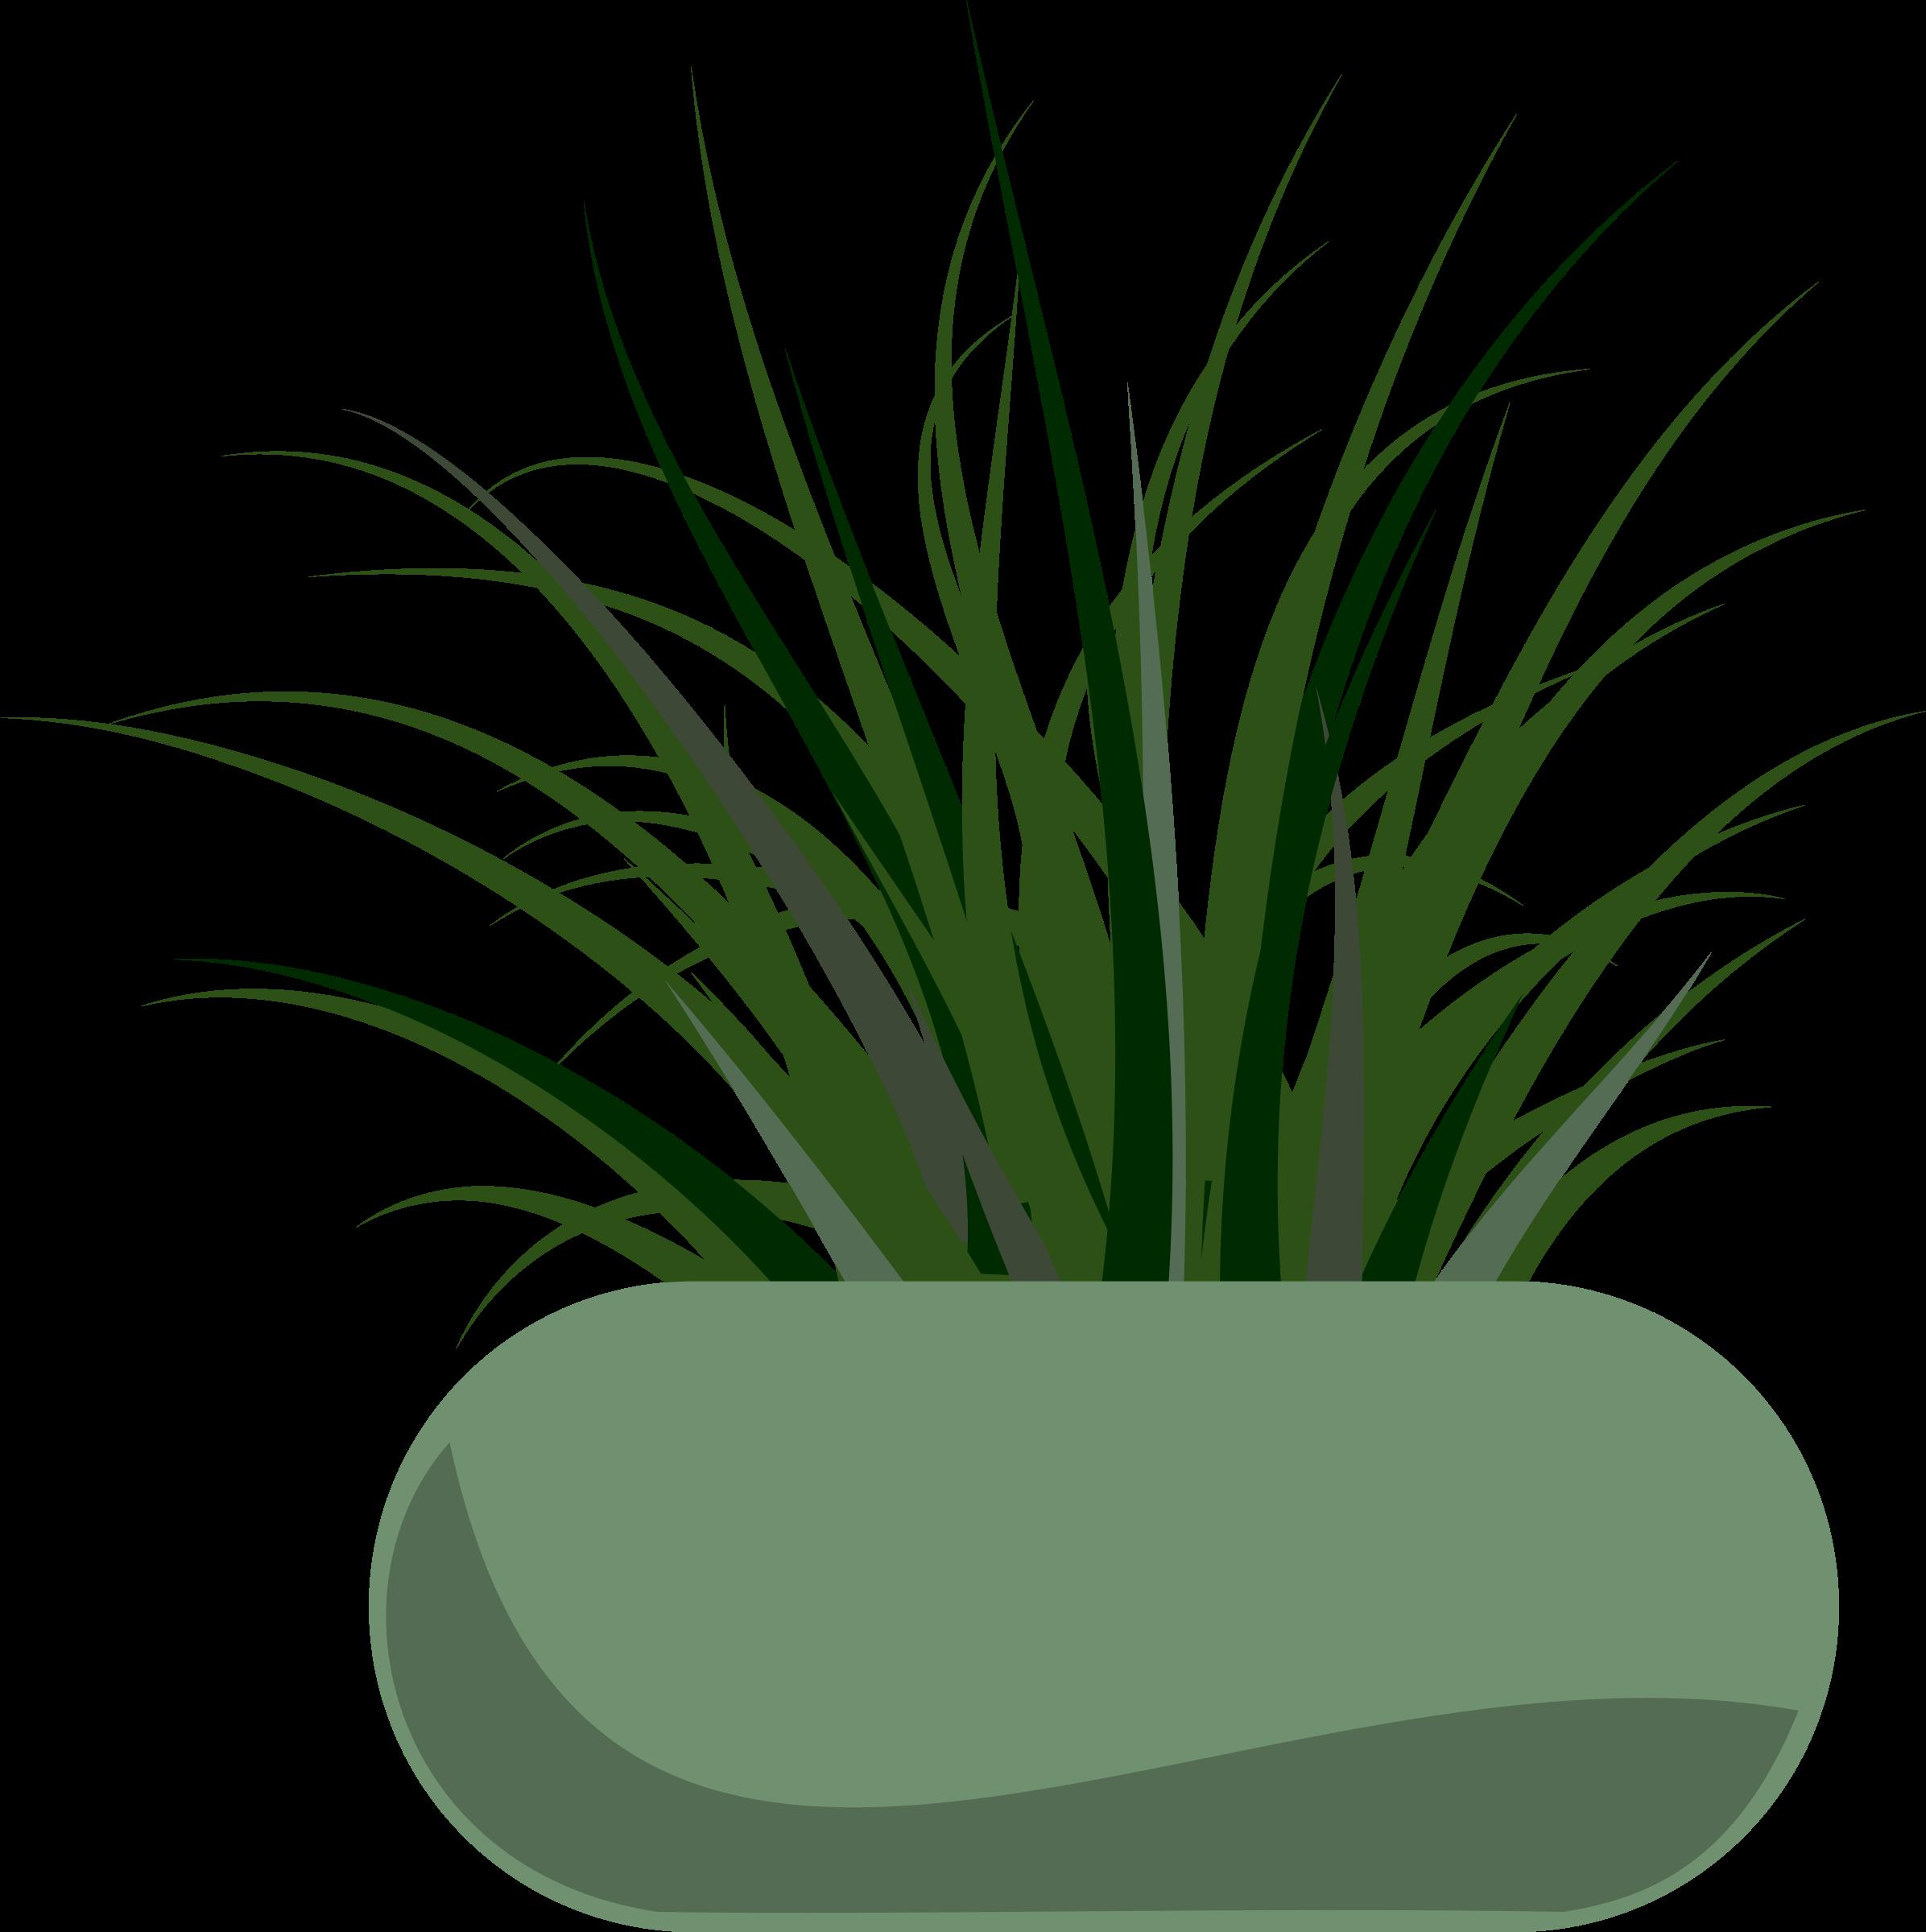 clip art image. Grass clipart outline